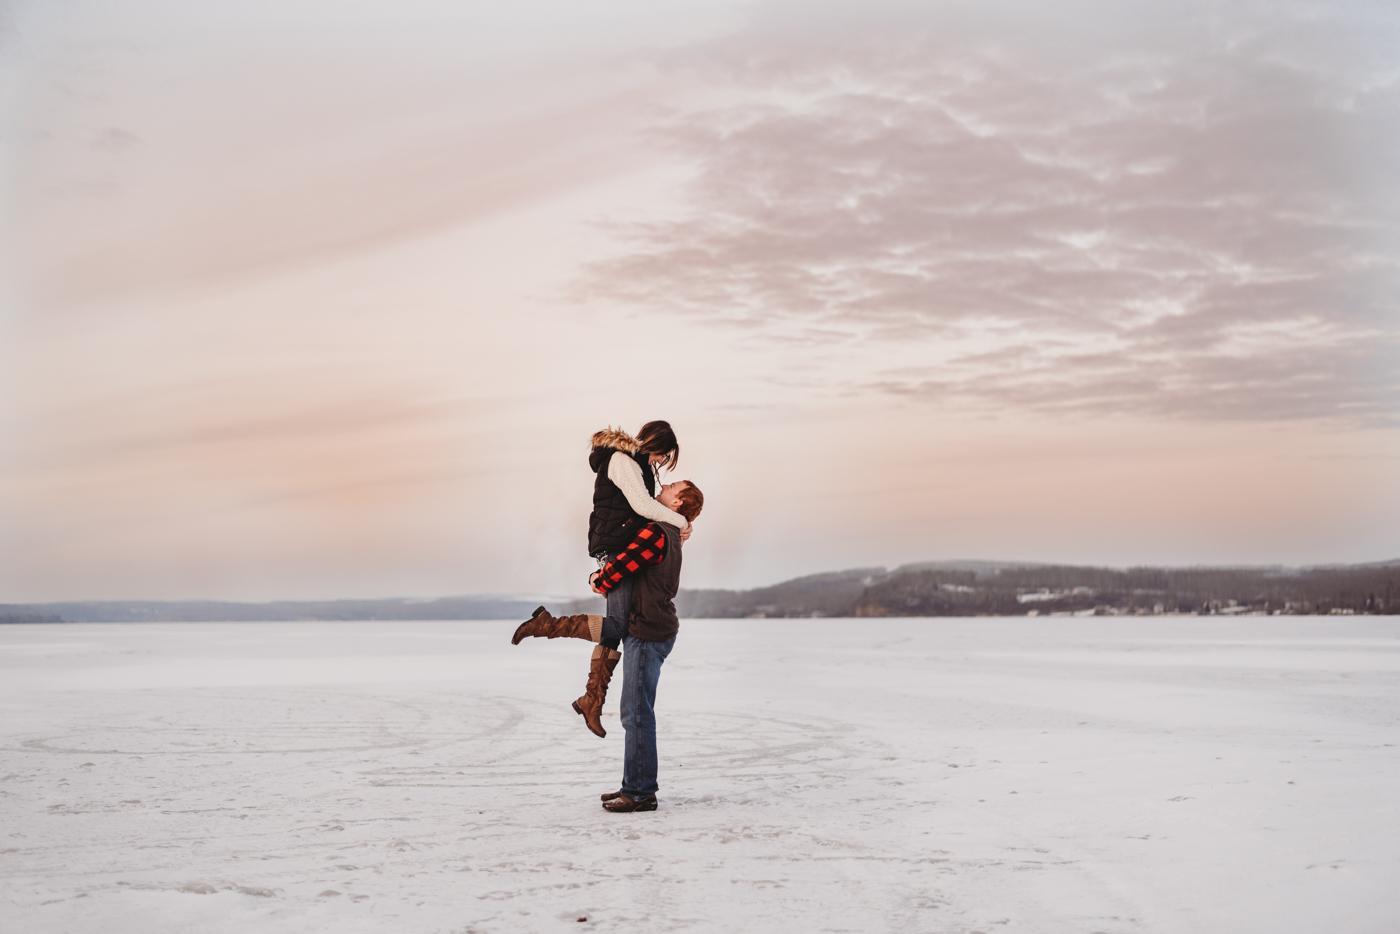 FortSt.John_photographer_TyraEPhotography_Wedding_Couple_Family_Photograhy_DawsonCreek_Elopement_Bride_Boduoir_Portraits-7737-2.jpg